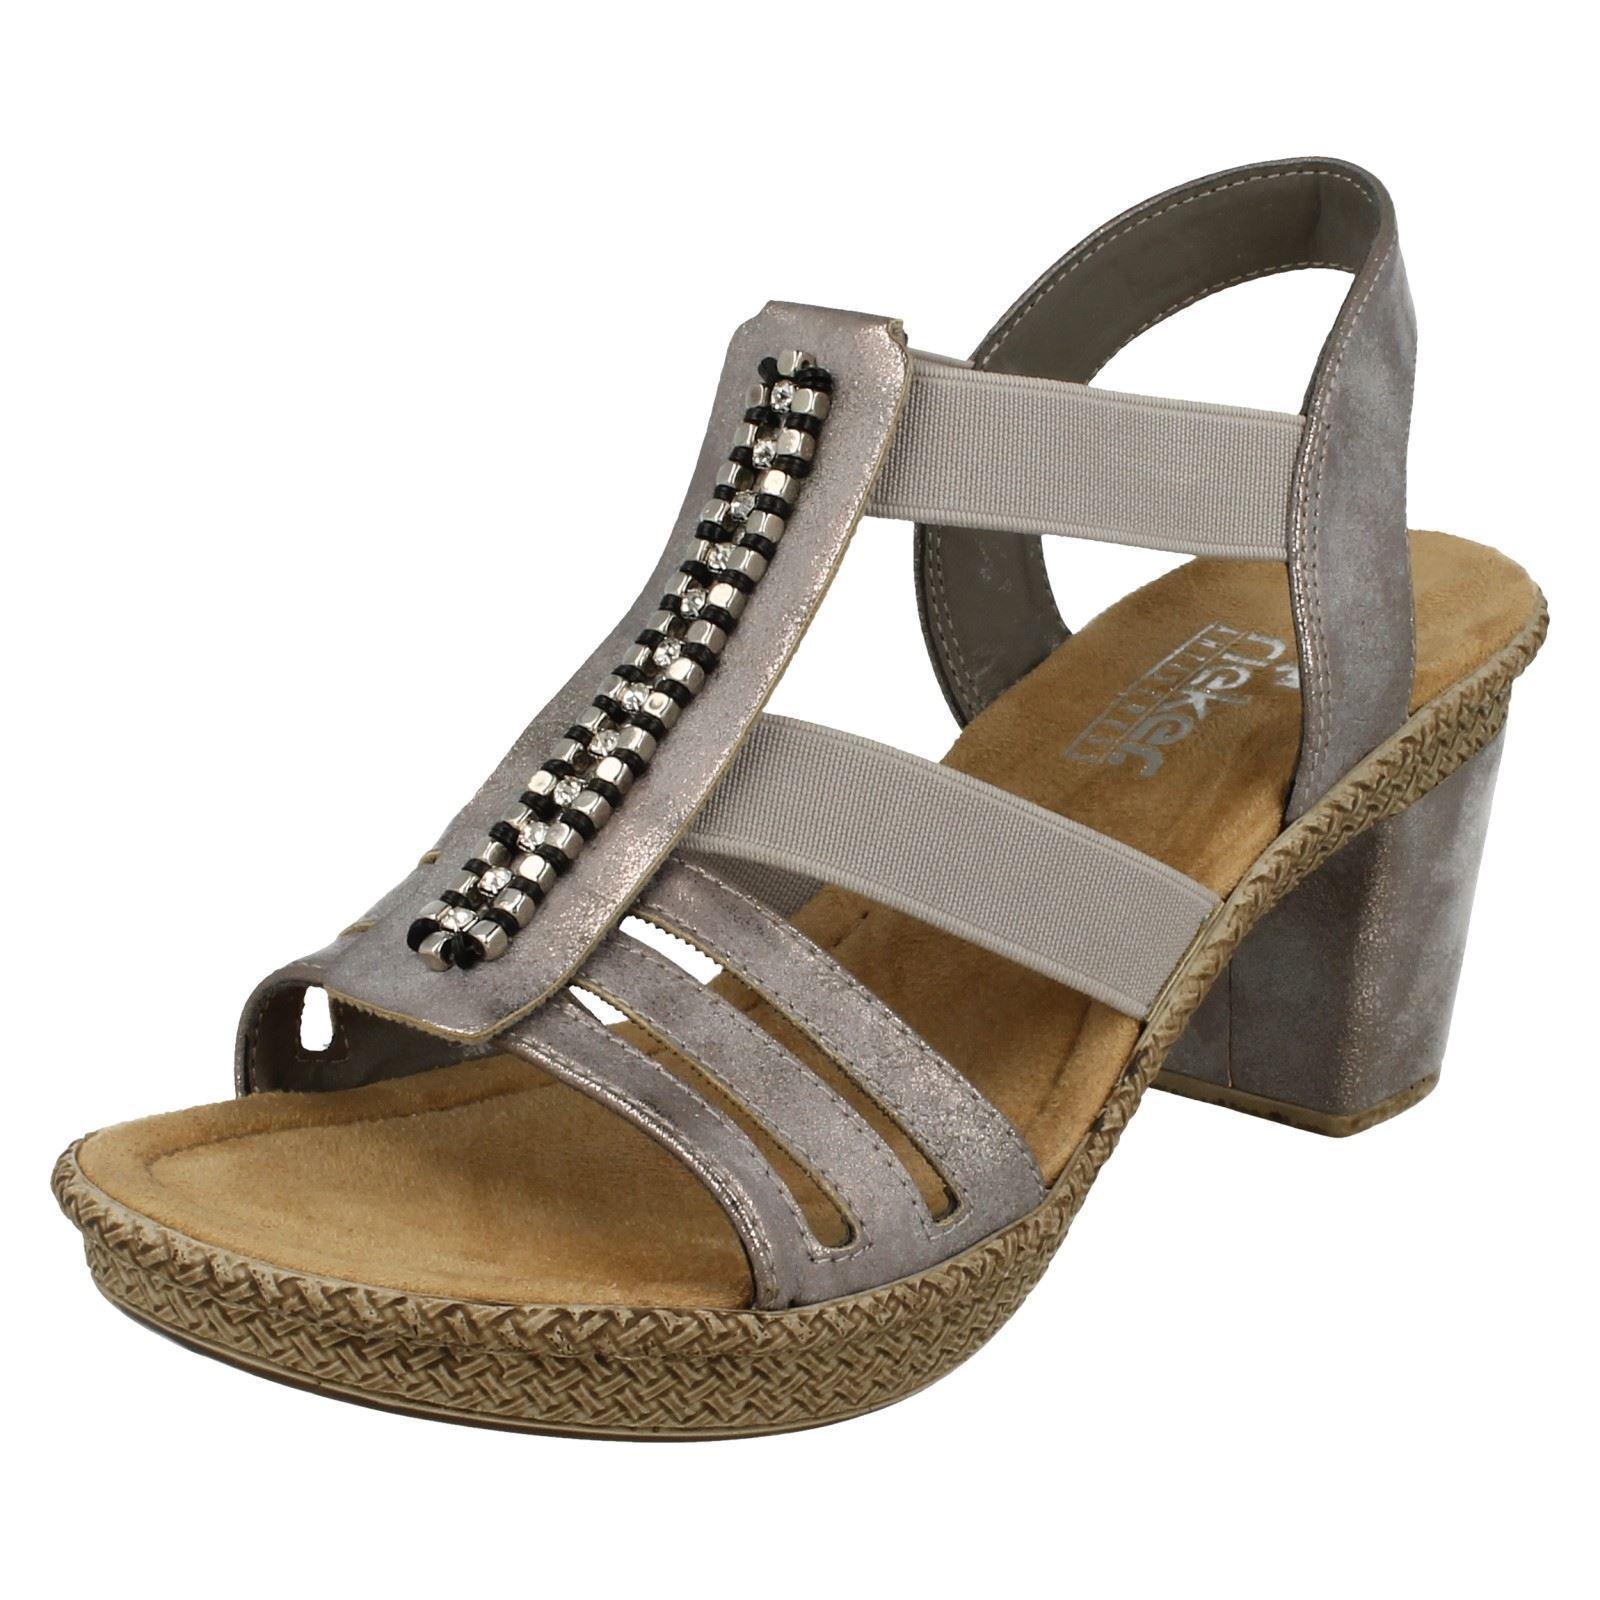 Donna Rieker 66584 Grigio Sintetico Casual Elegante Sandali Con Tacco